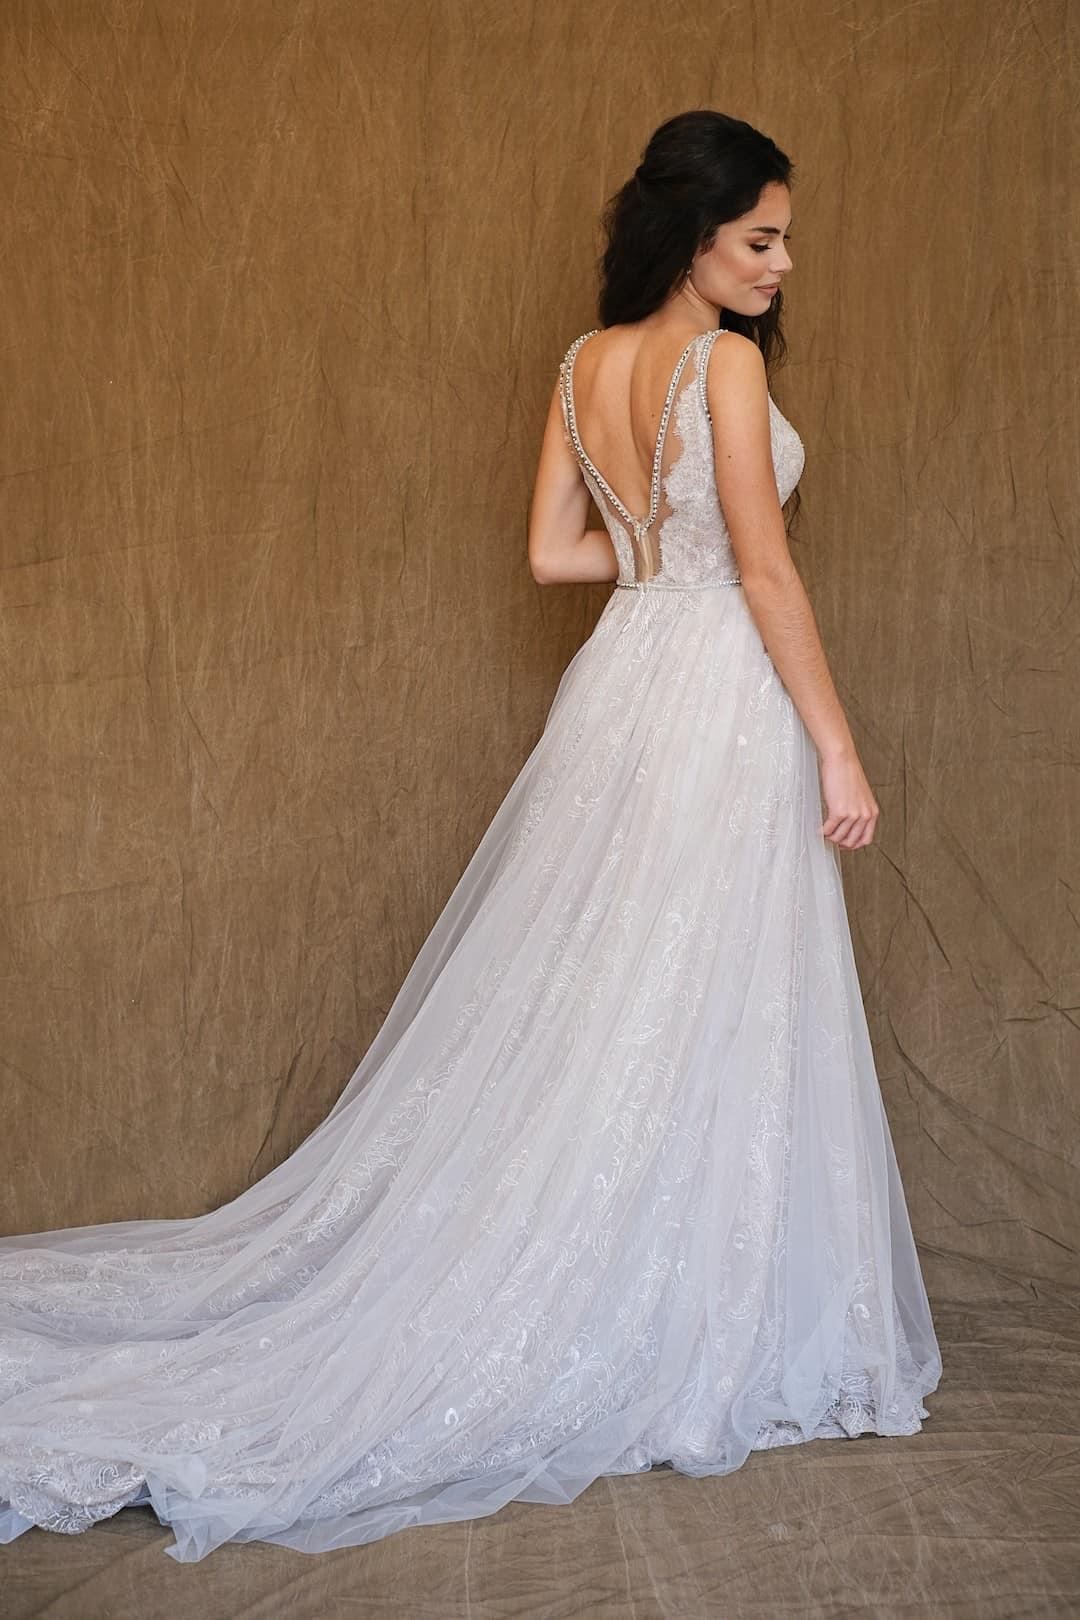 Haute Couture Brautkleider - Galia Lahav - Gala 711 - back